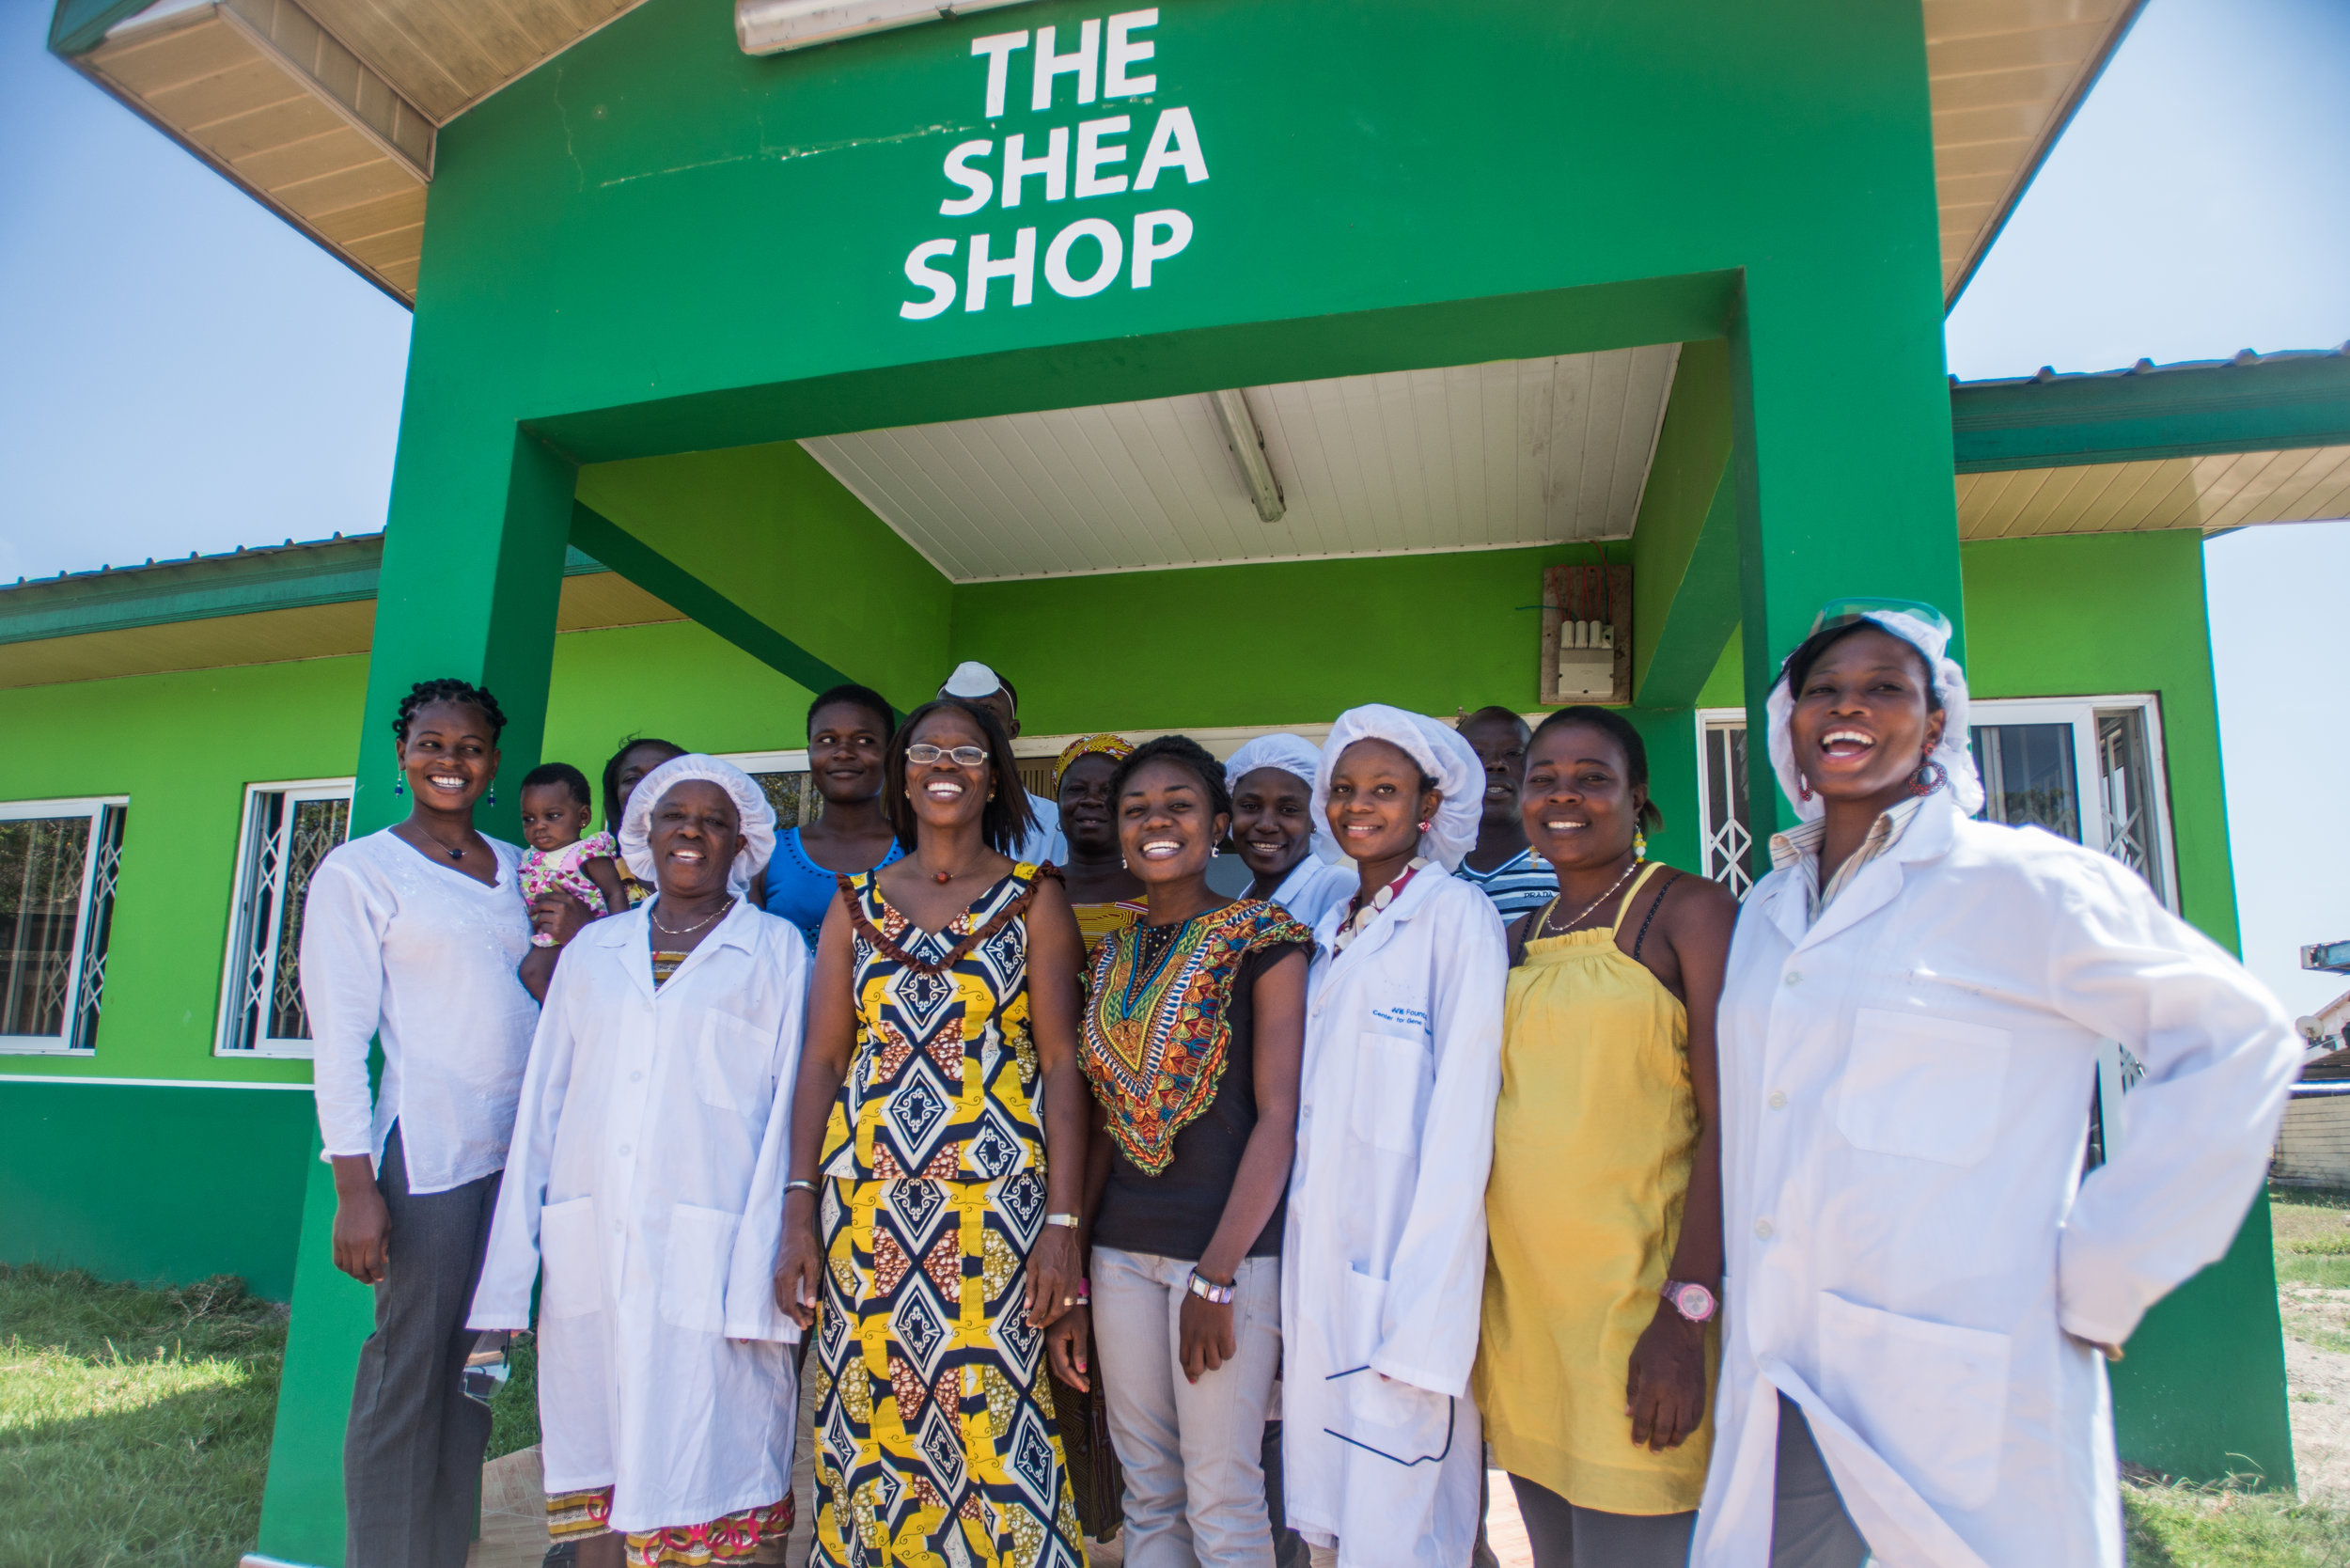 Photo: Cherie Blair Foundation for women